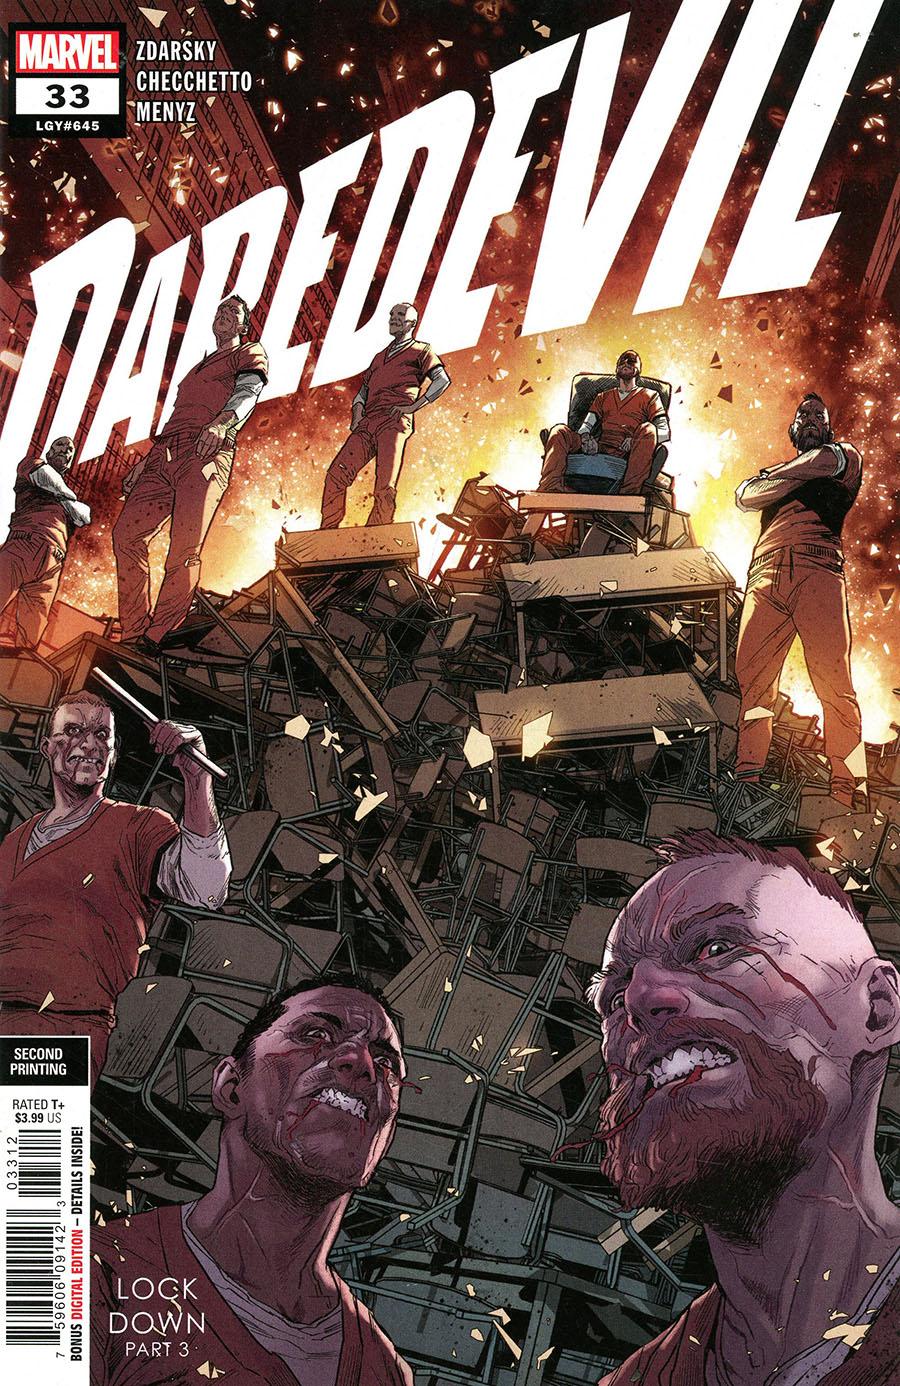 Daredevil Vol 6 #33 Cover C 2nd Ptg Variant Cover